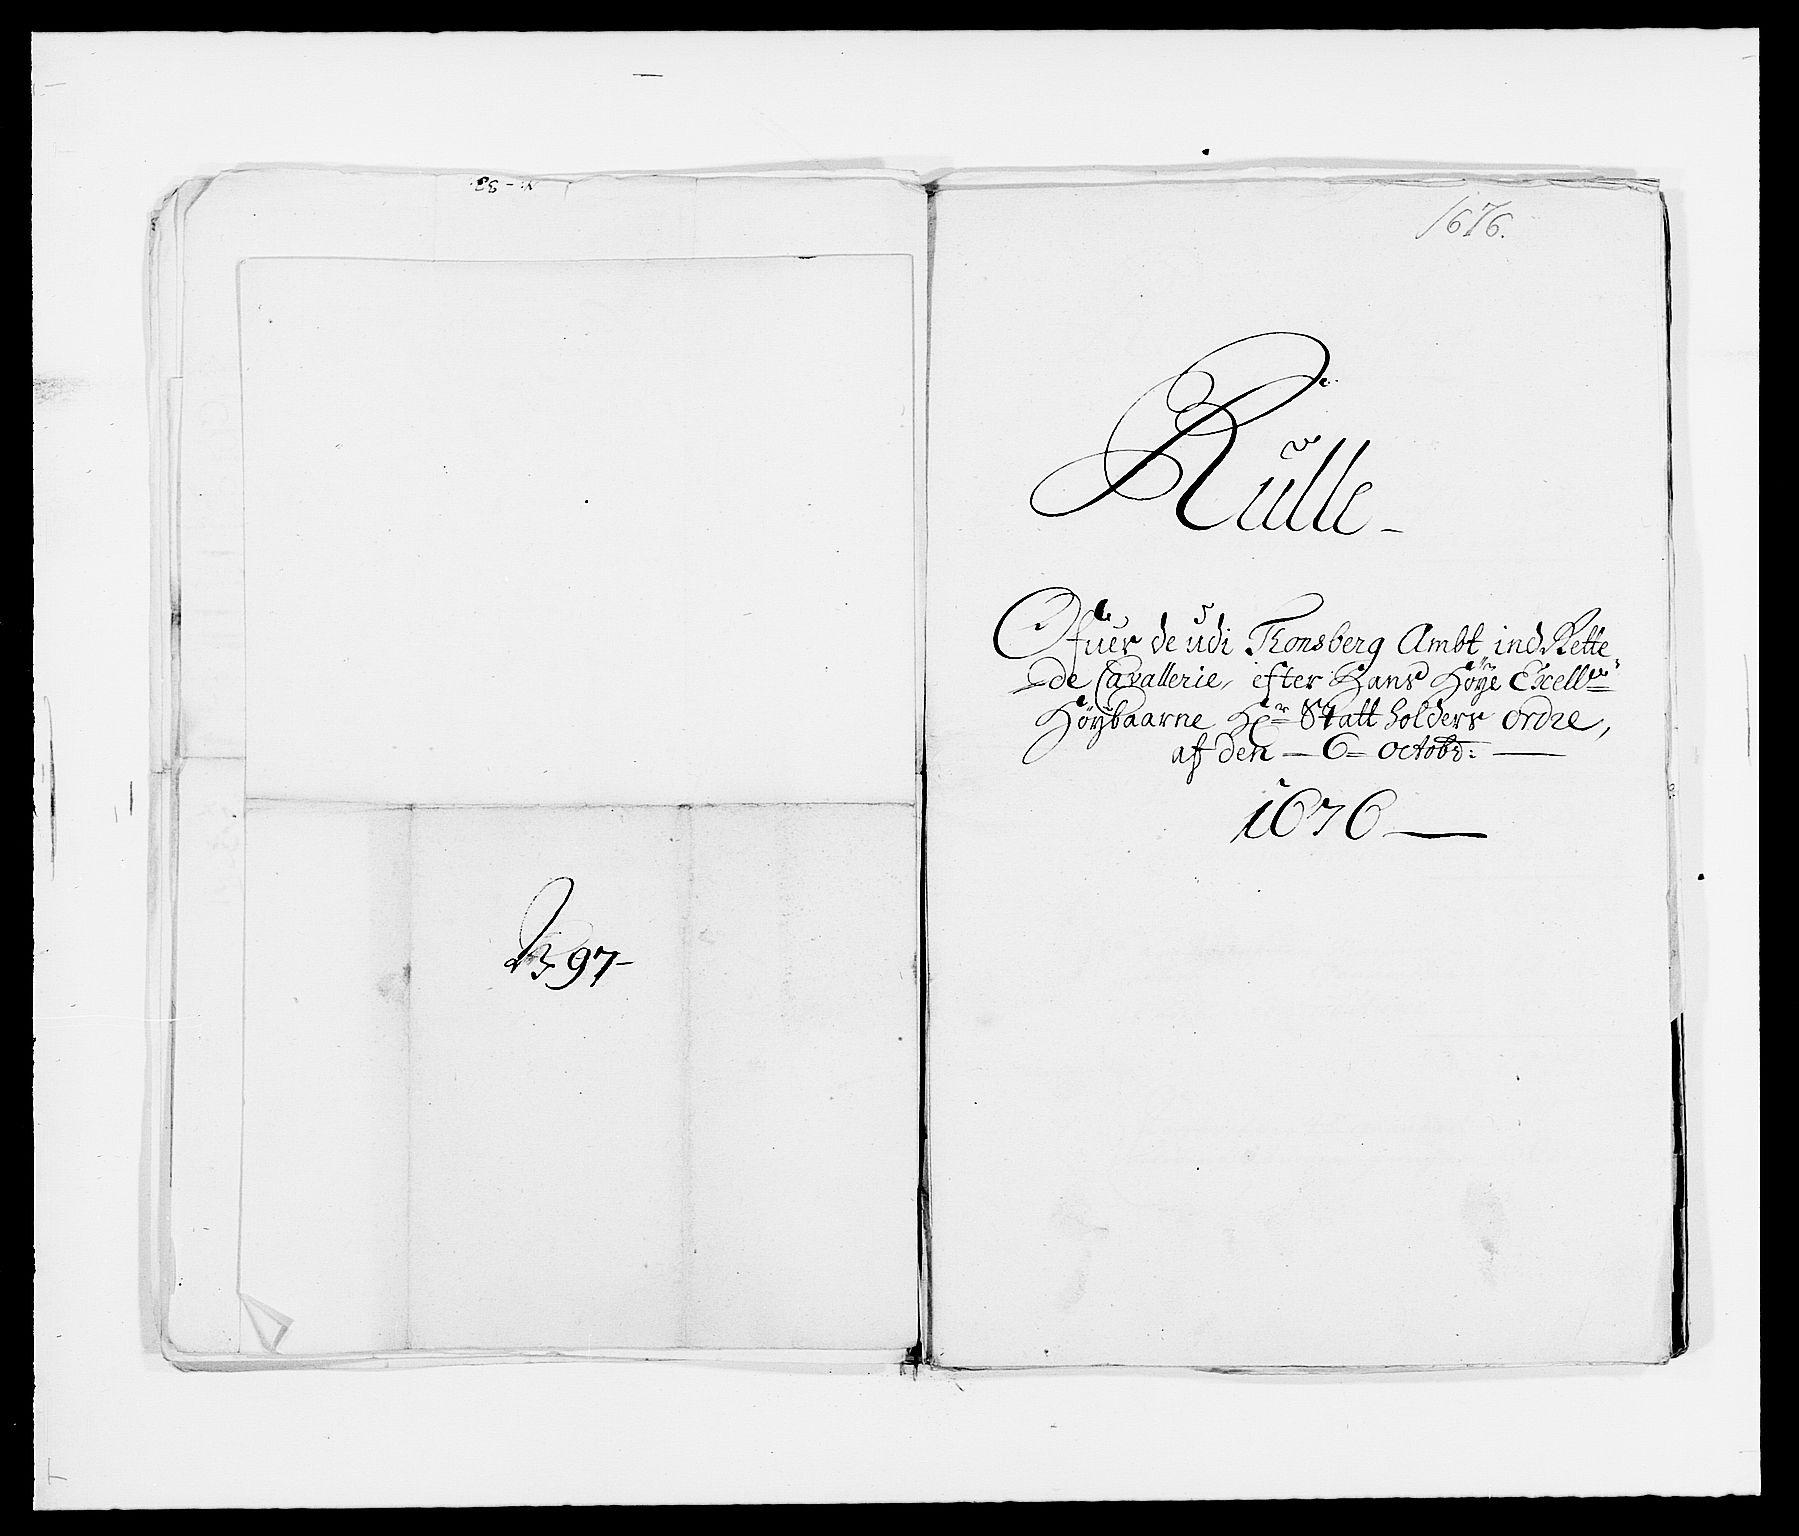 RA, Rentekammeret inntil 1814, Reviderte regnskaper, Fogderegnskap, R32/L1845: Fogderegnskap Jarlsberg grevskap, 1676-1678, s. 421